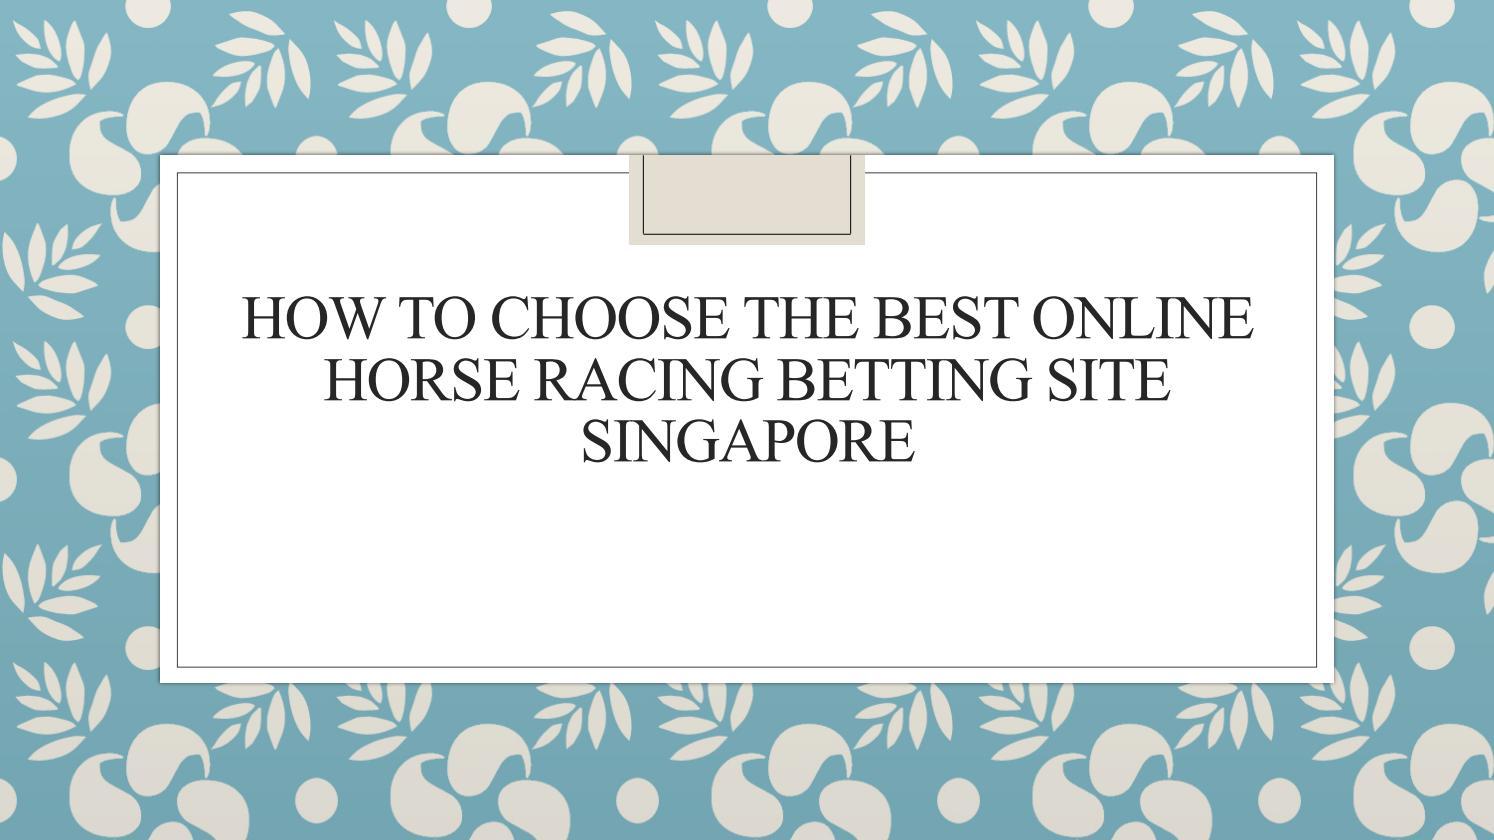 online horse racing betting sites